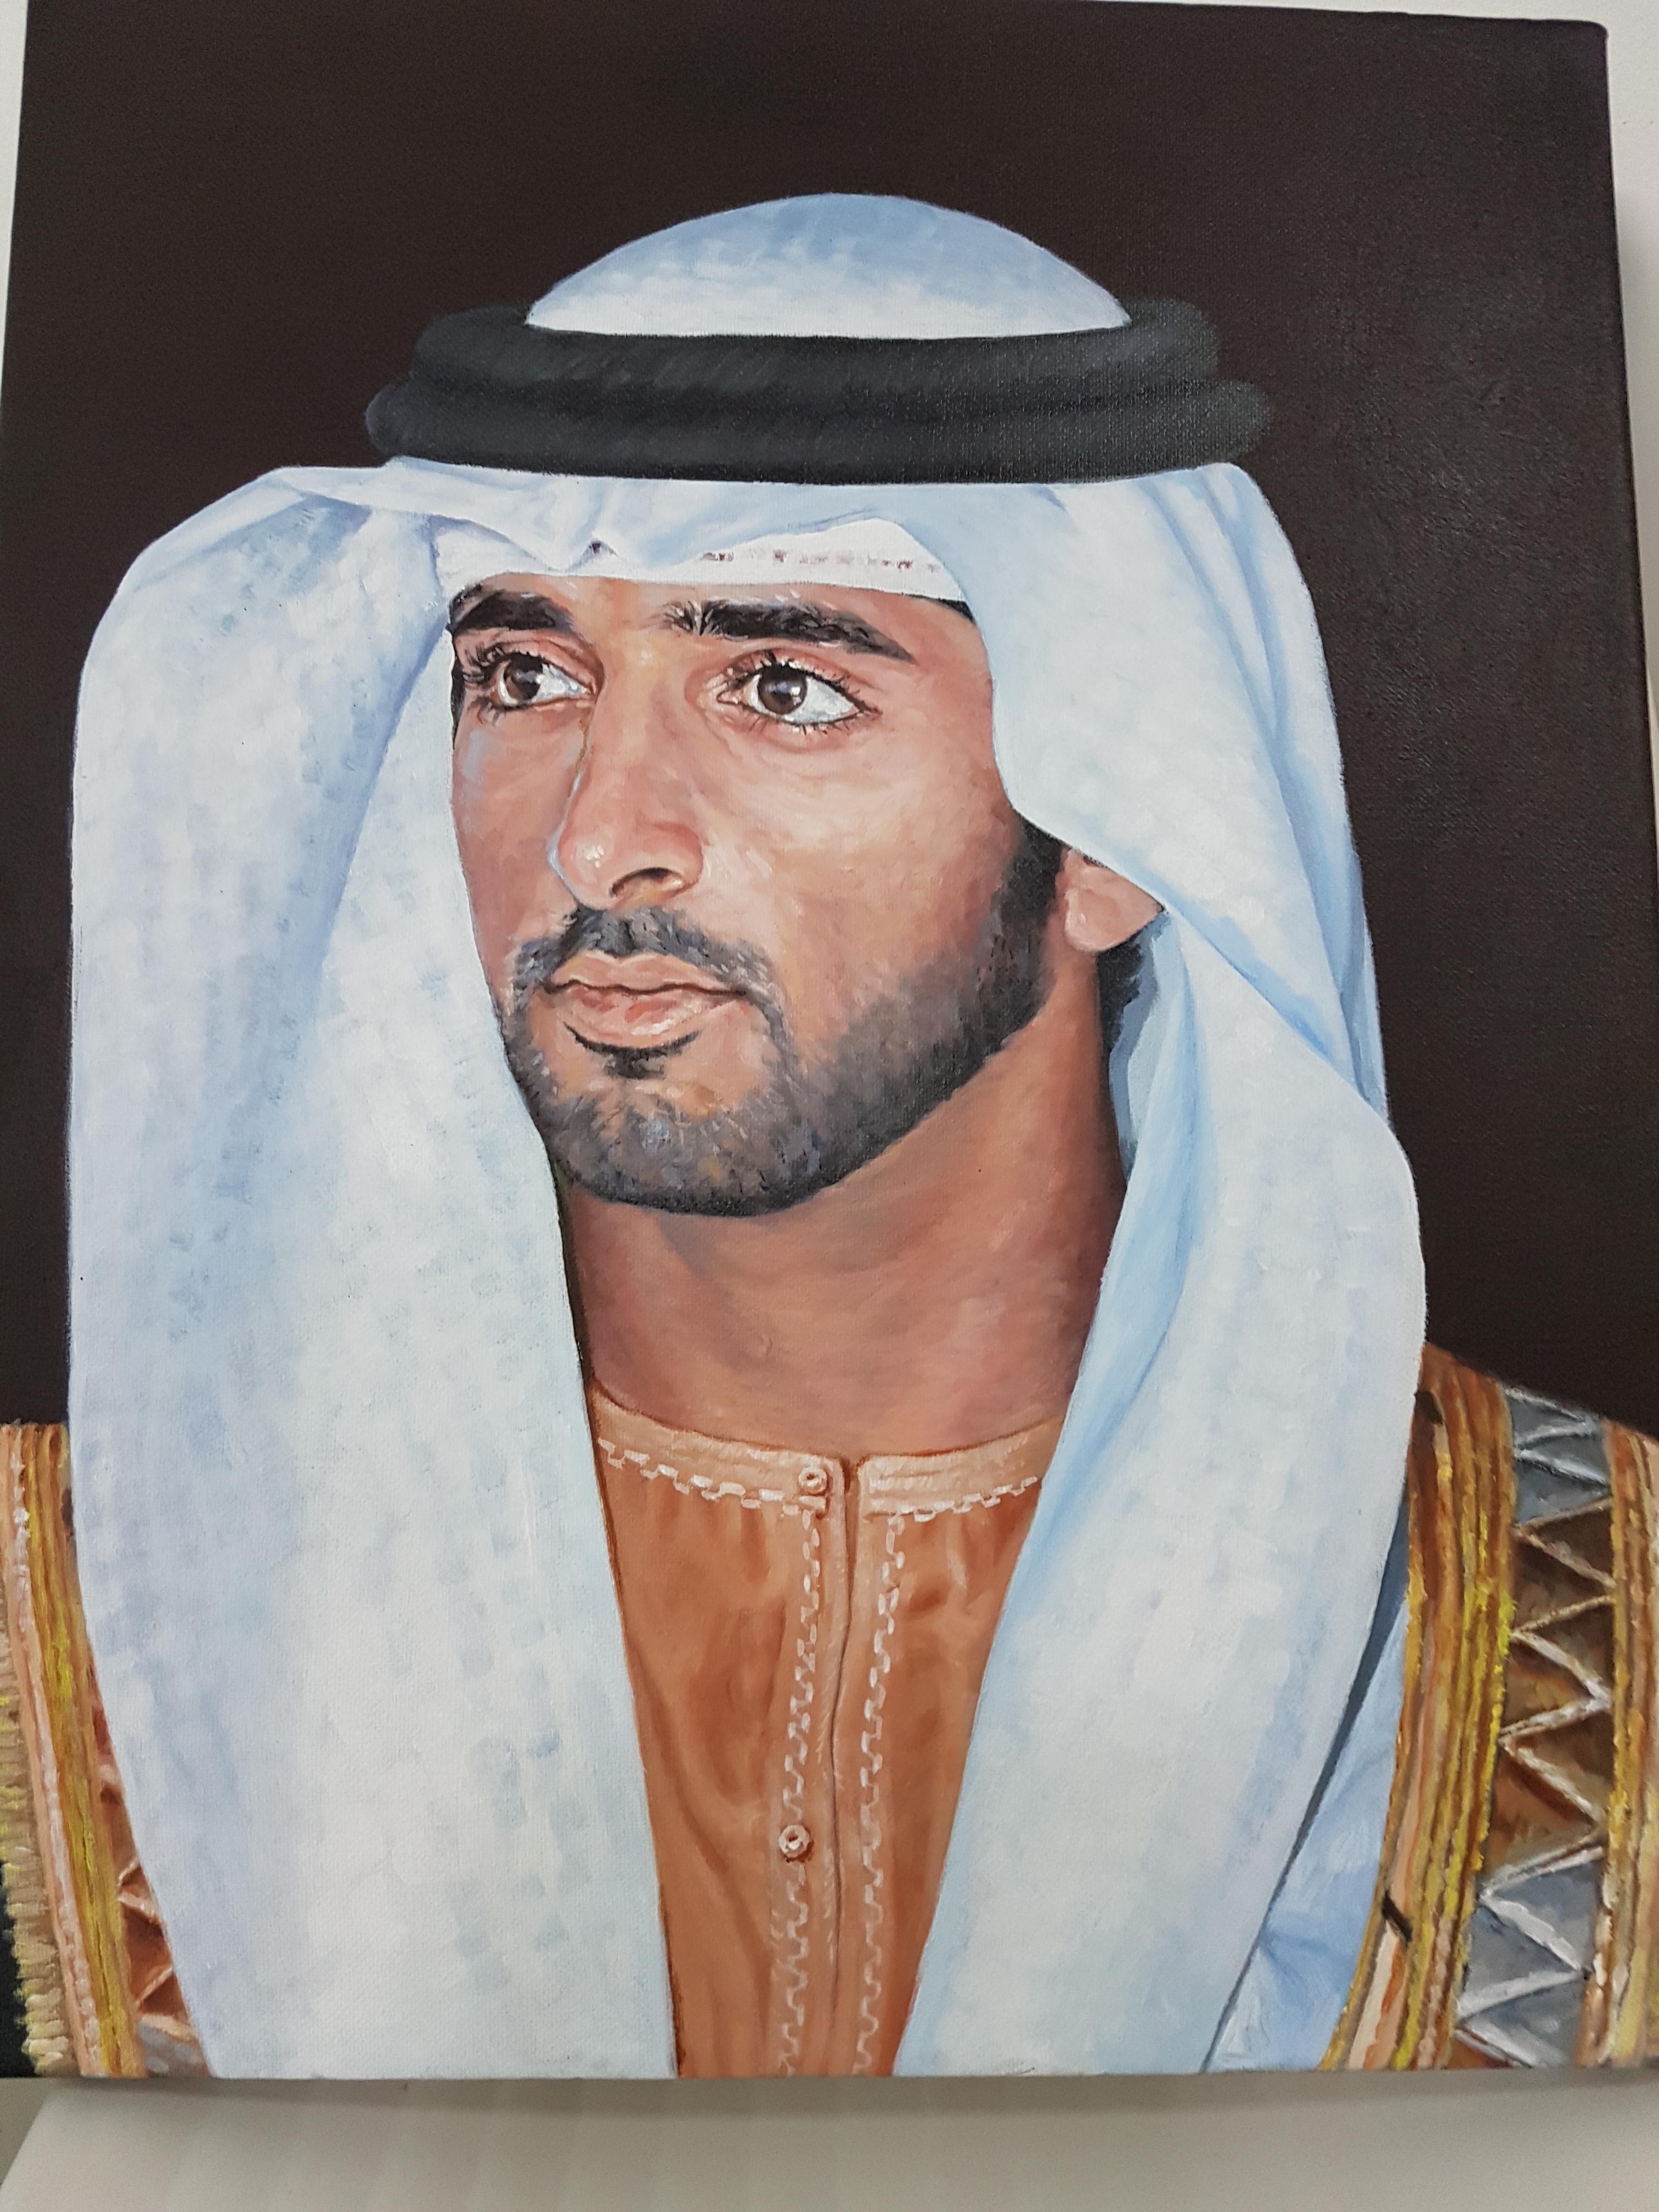 Shk Hamdan bin Mohammed Al Maktoum